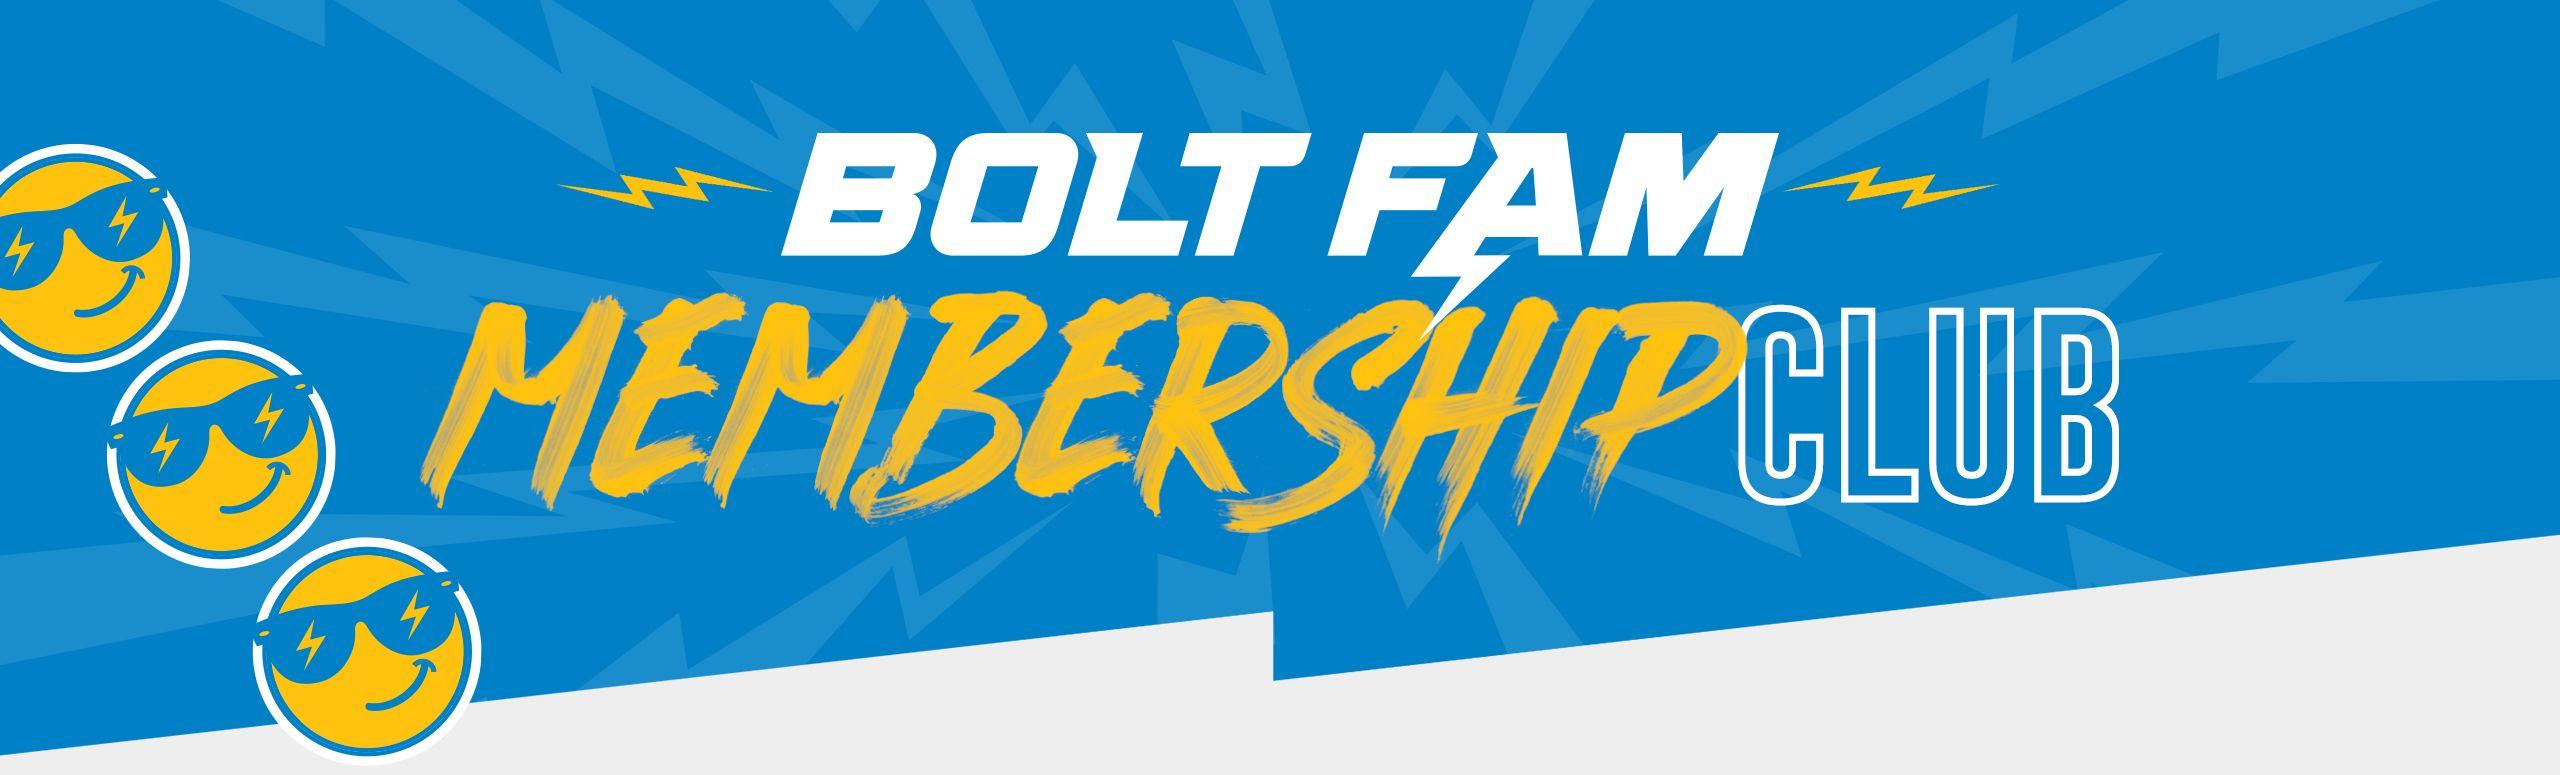 200715_Site_Tickets_Membership_Club